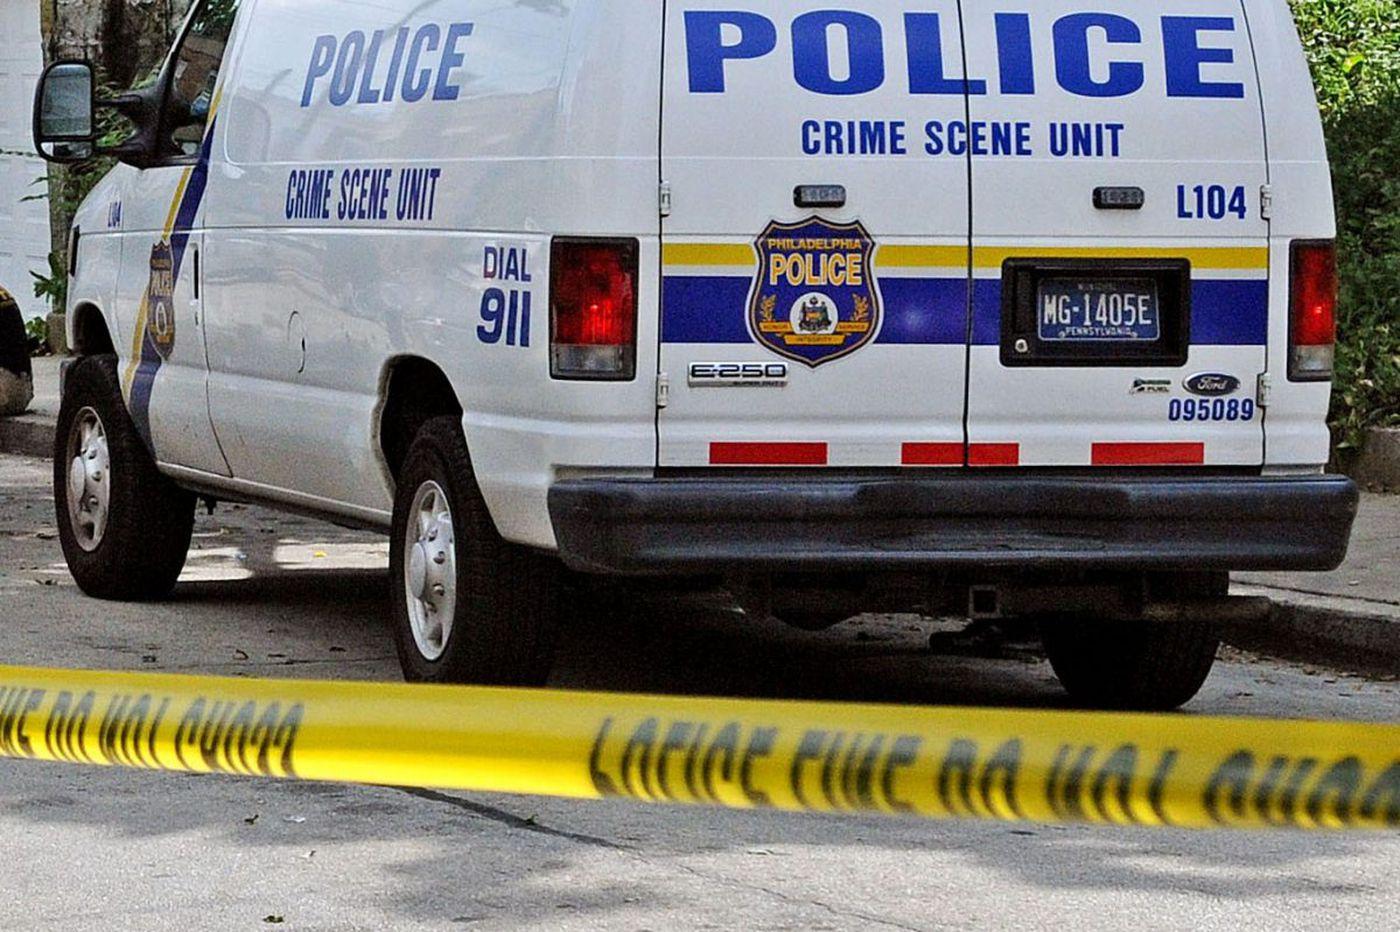 Police fatally shoot armed man in North Philadelphia